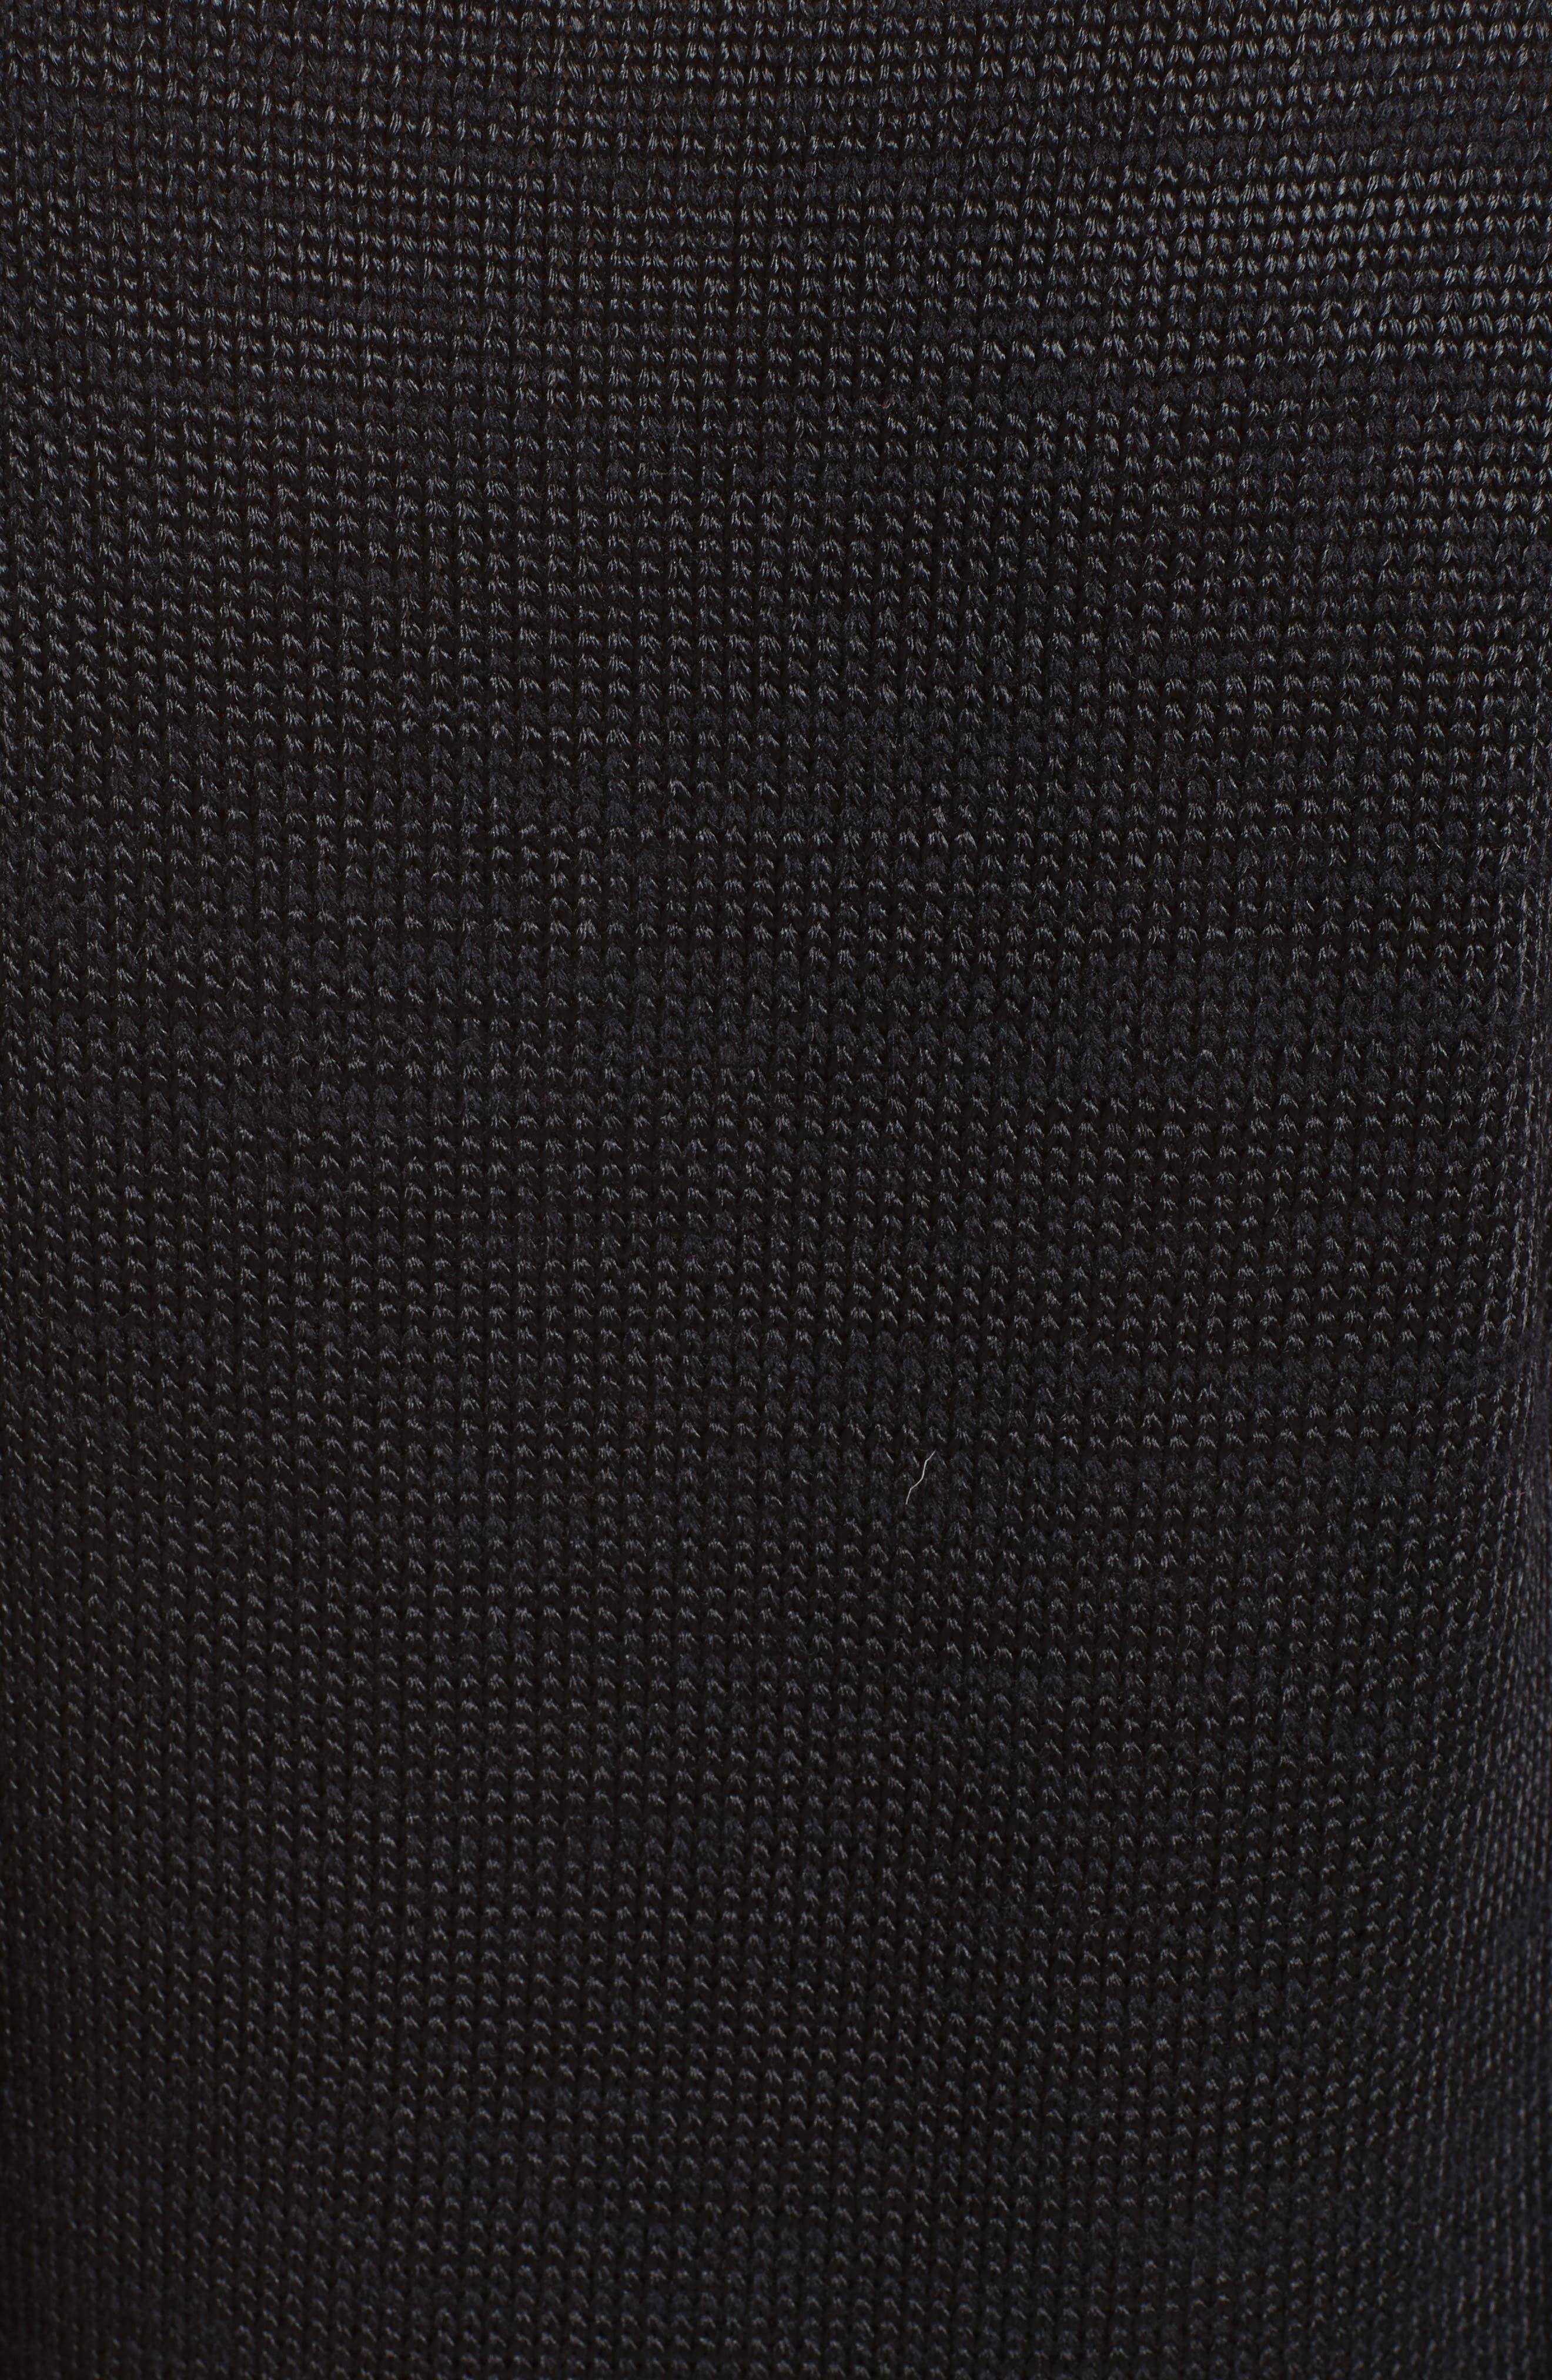 '80s Stripe Knit Sweater,                             Alternate thumbnail 6, color,                             002